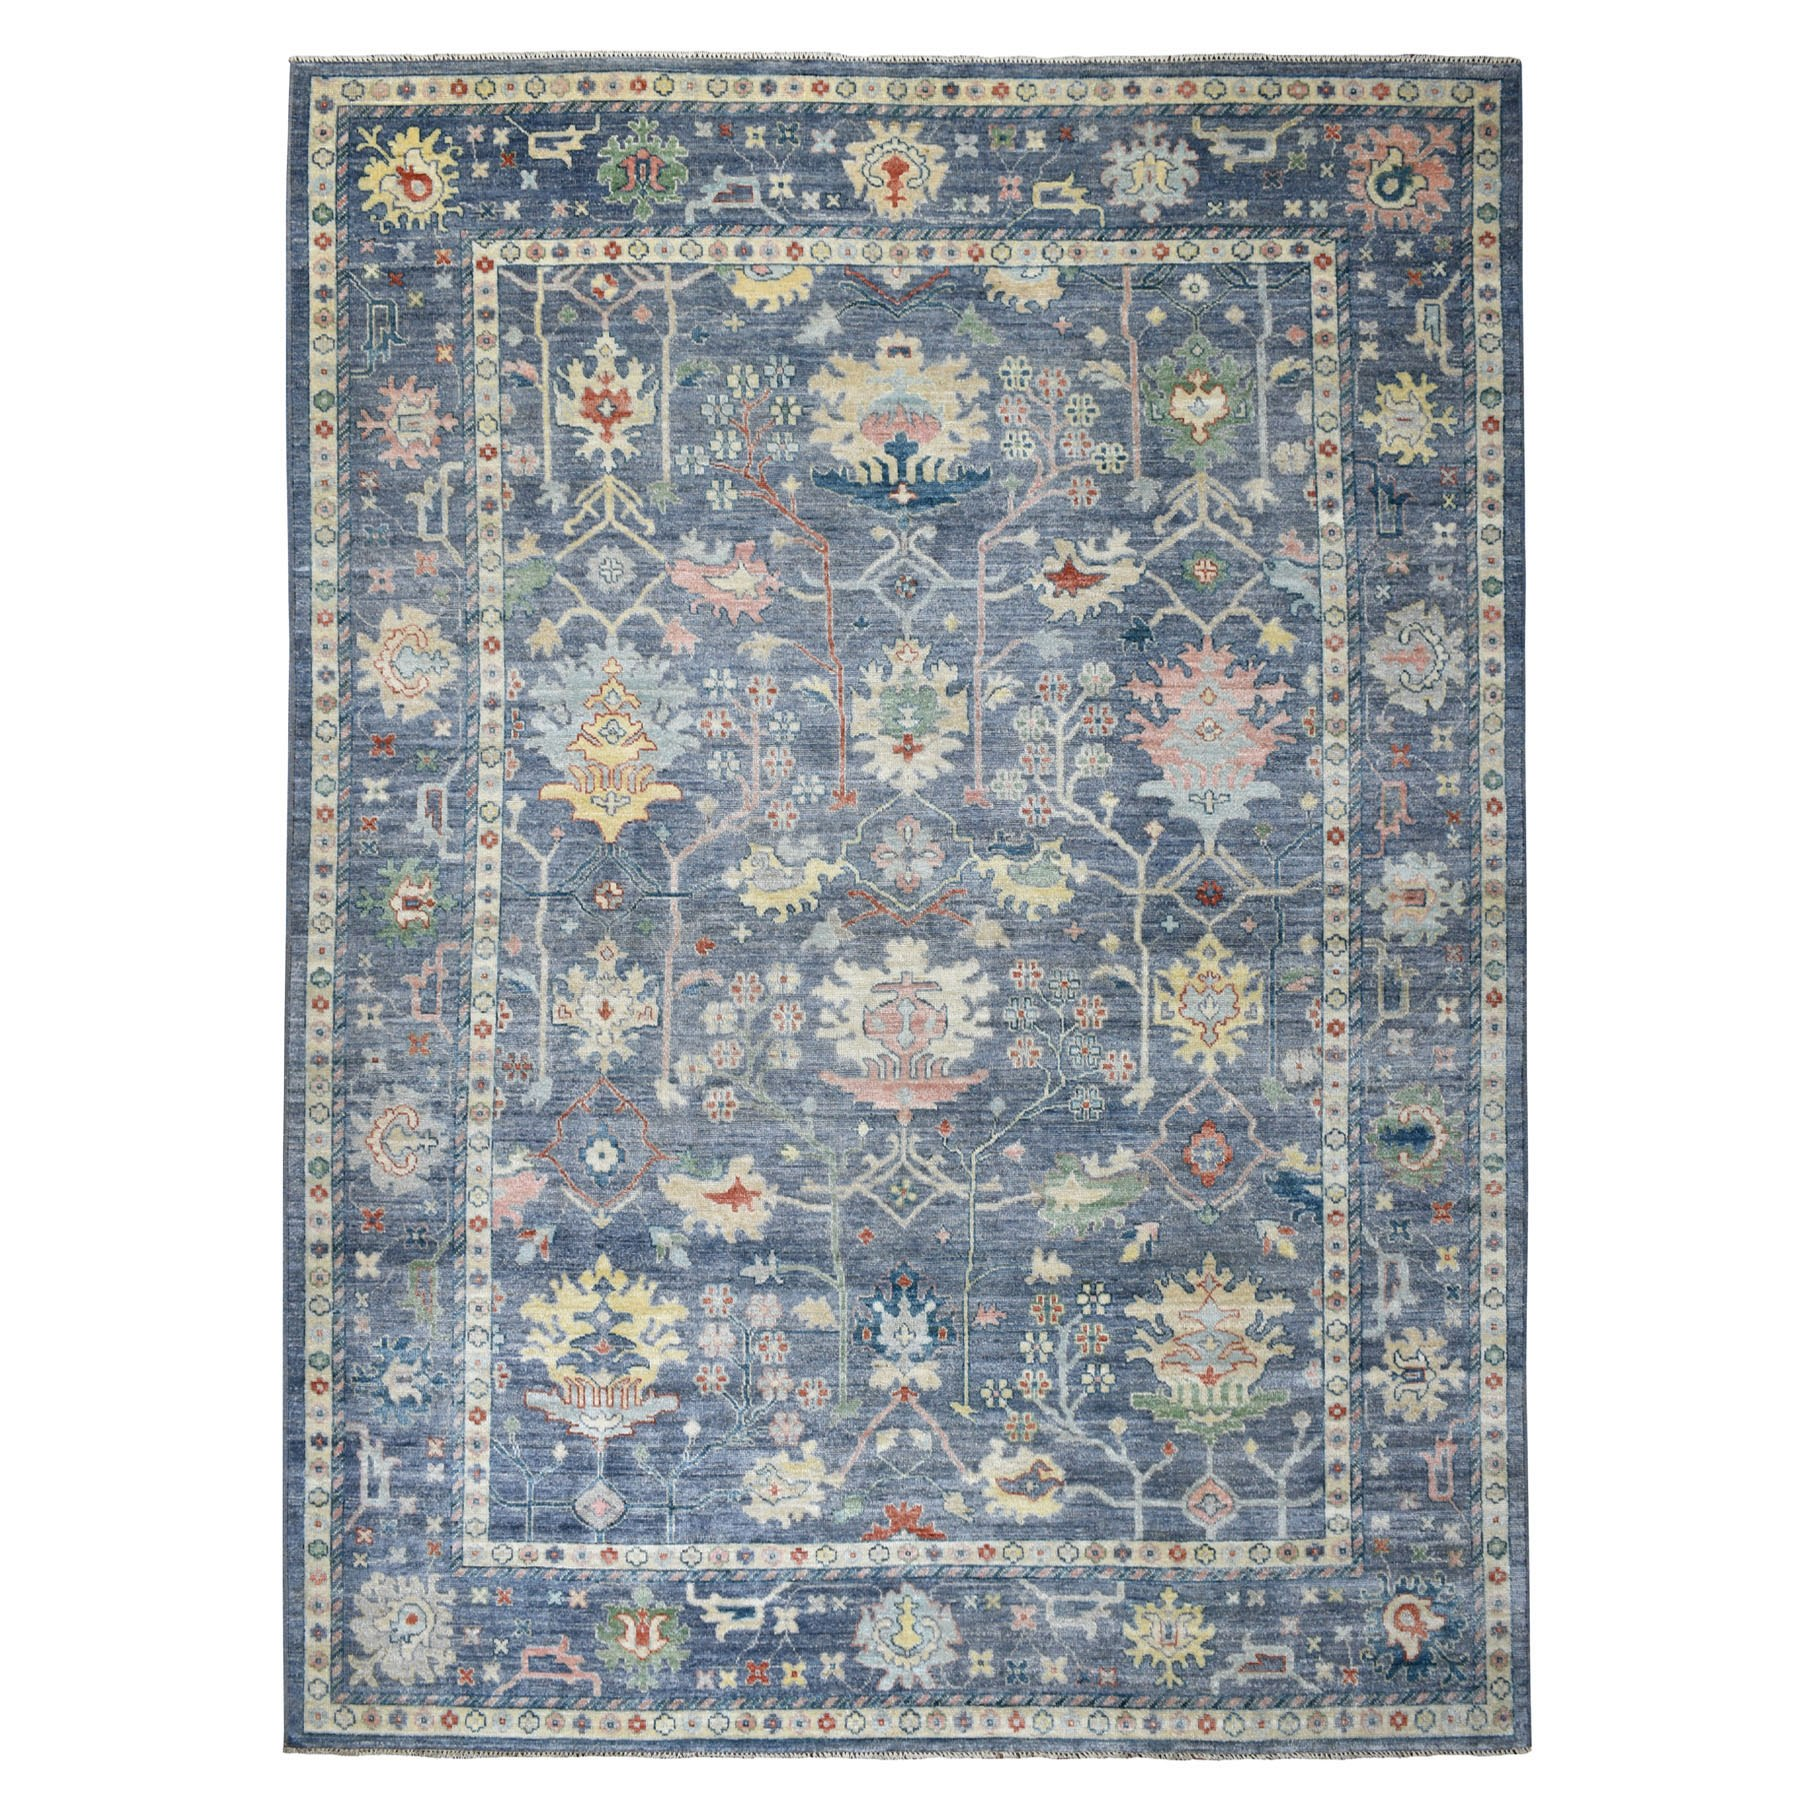 9'X12' Blue Angora Oushak With Soft Velvety Wool Hand Knotted Oriental Rug moaedd77